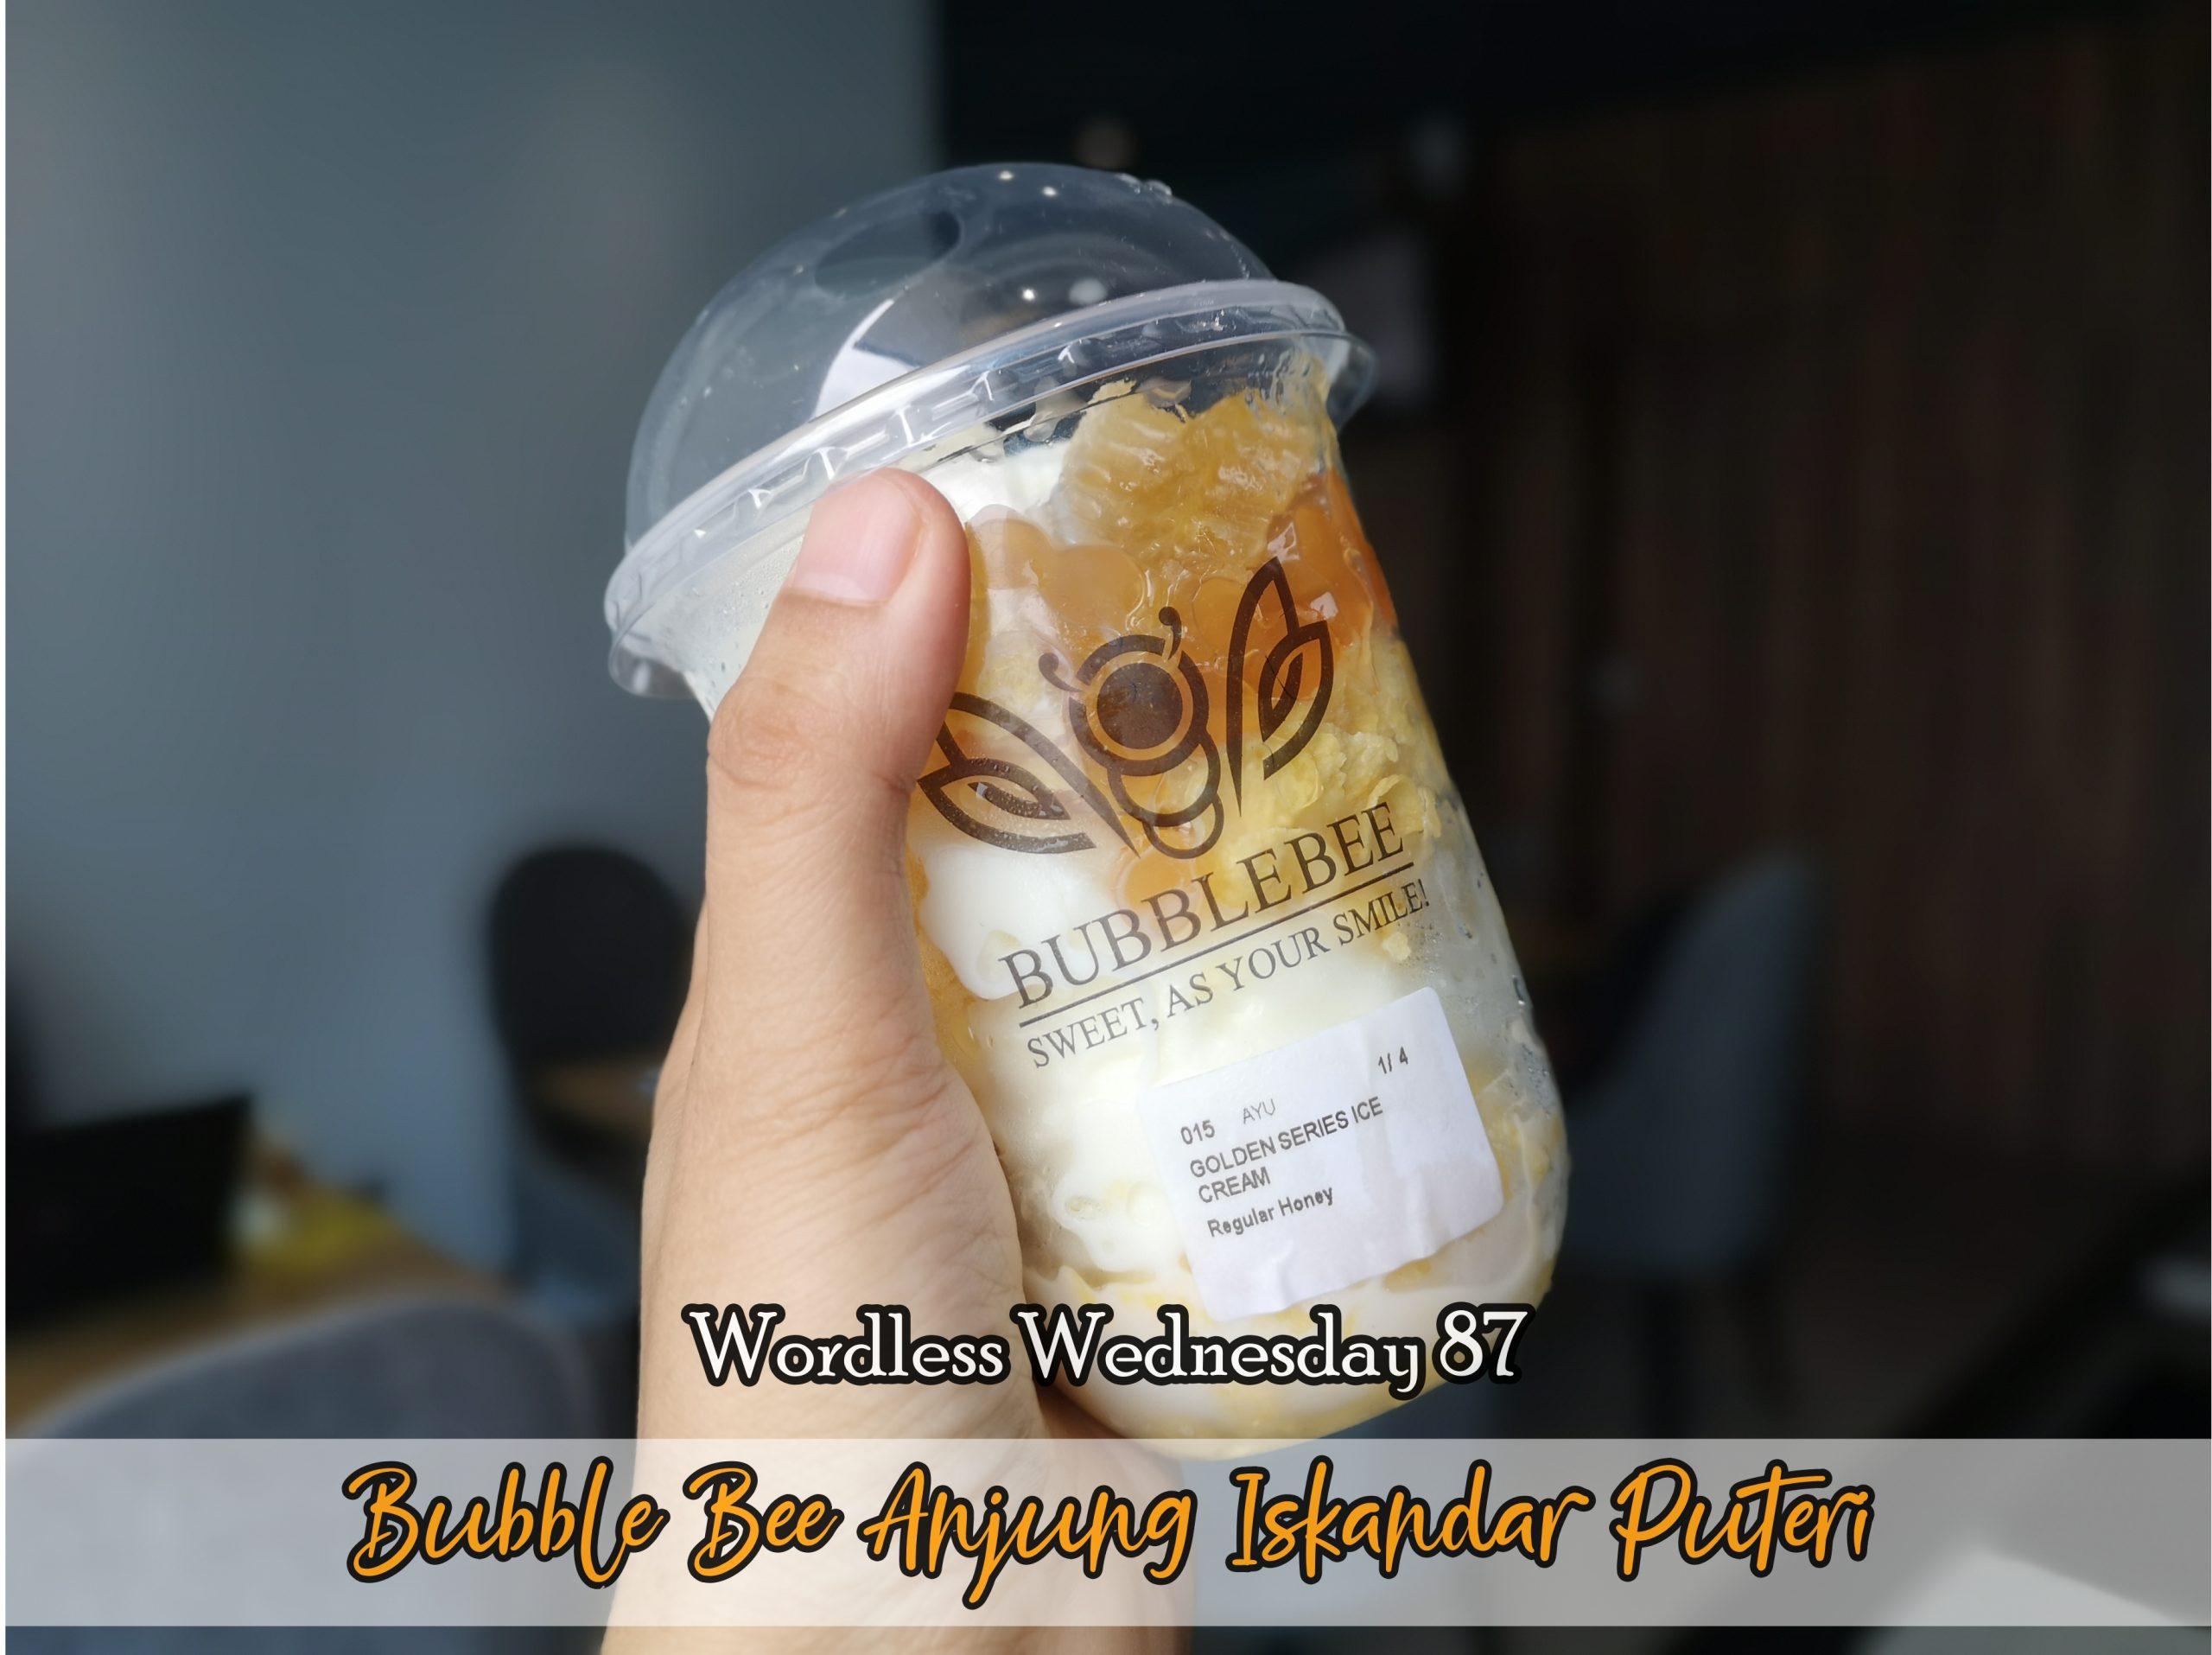 Wordless Wednesday 87 - Bubble Bee Anjung Iskandar Puteri